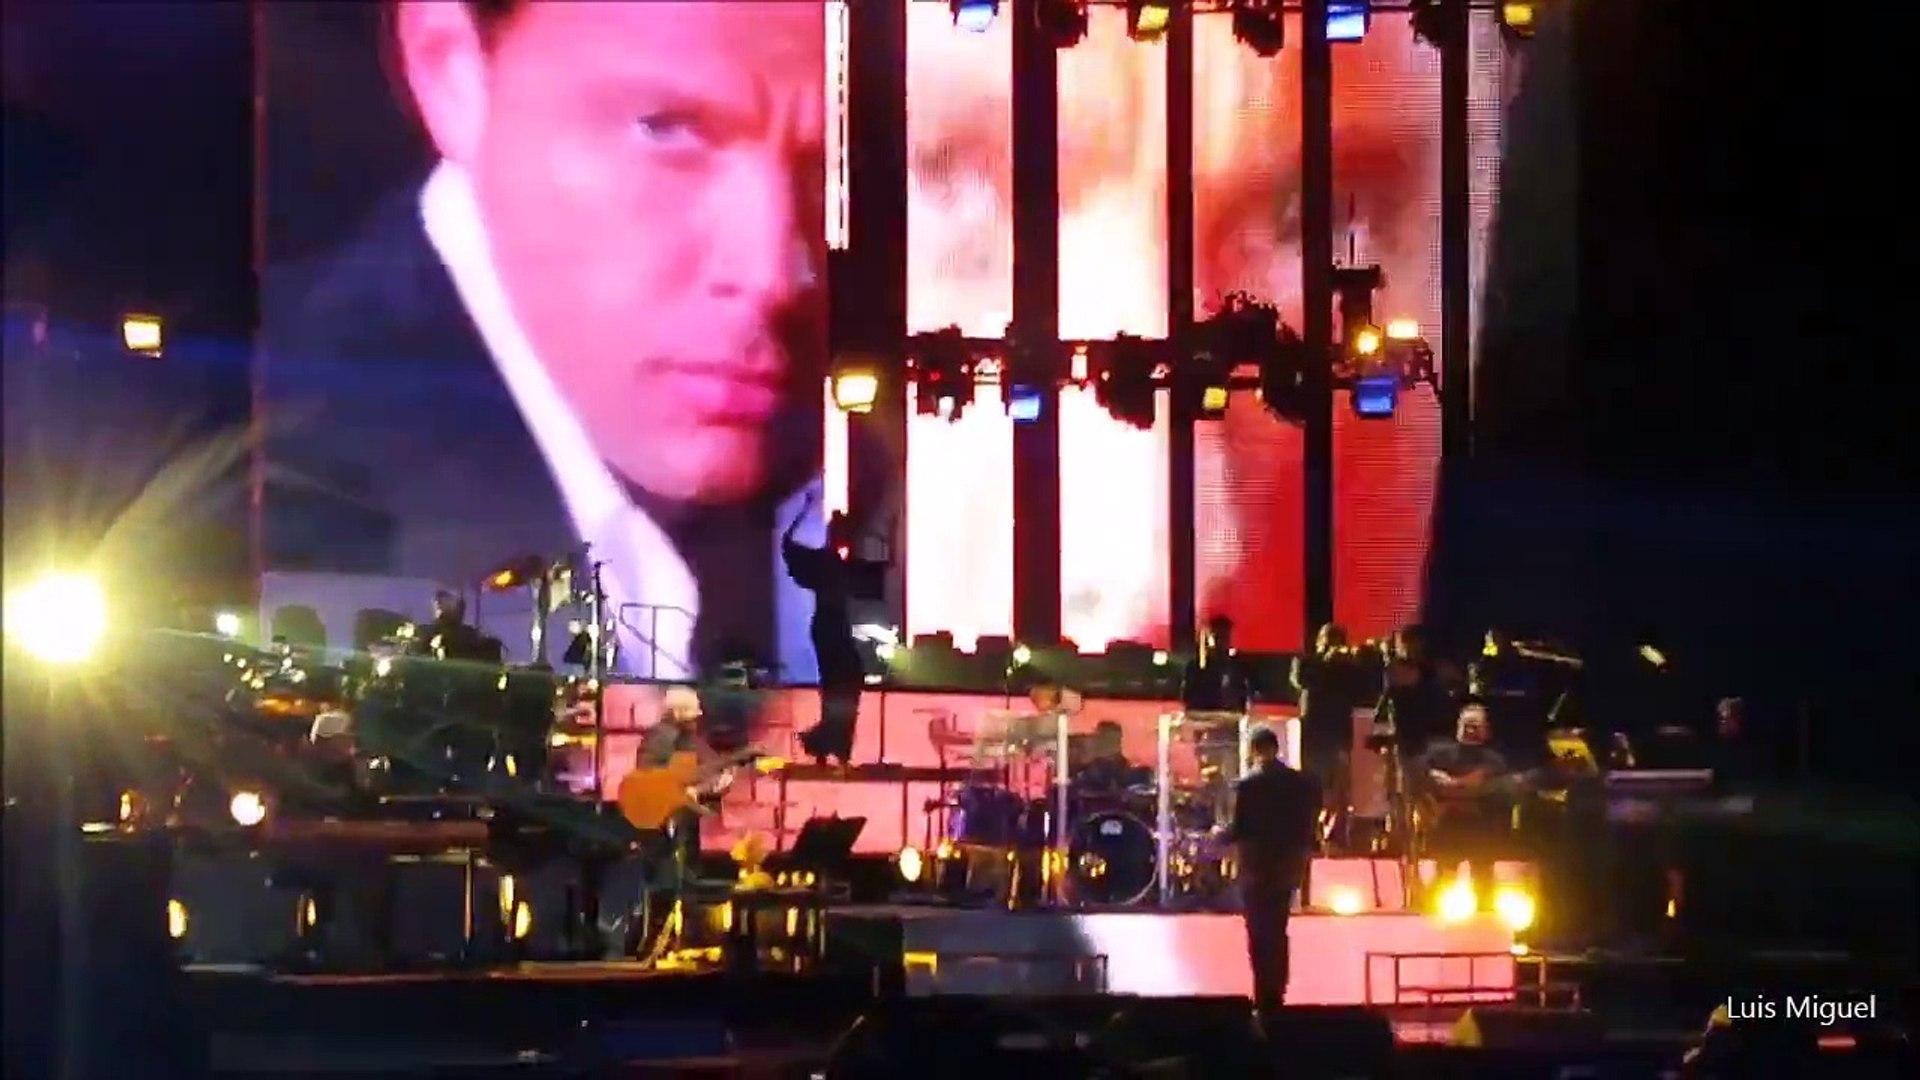 Luis Miguel Salt Lake City 11 sept 2015 - Suave/La última noche/Amor,amor,amor